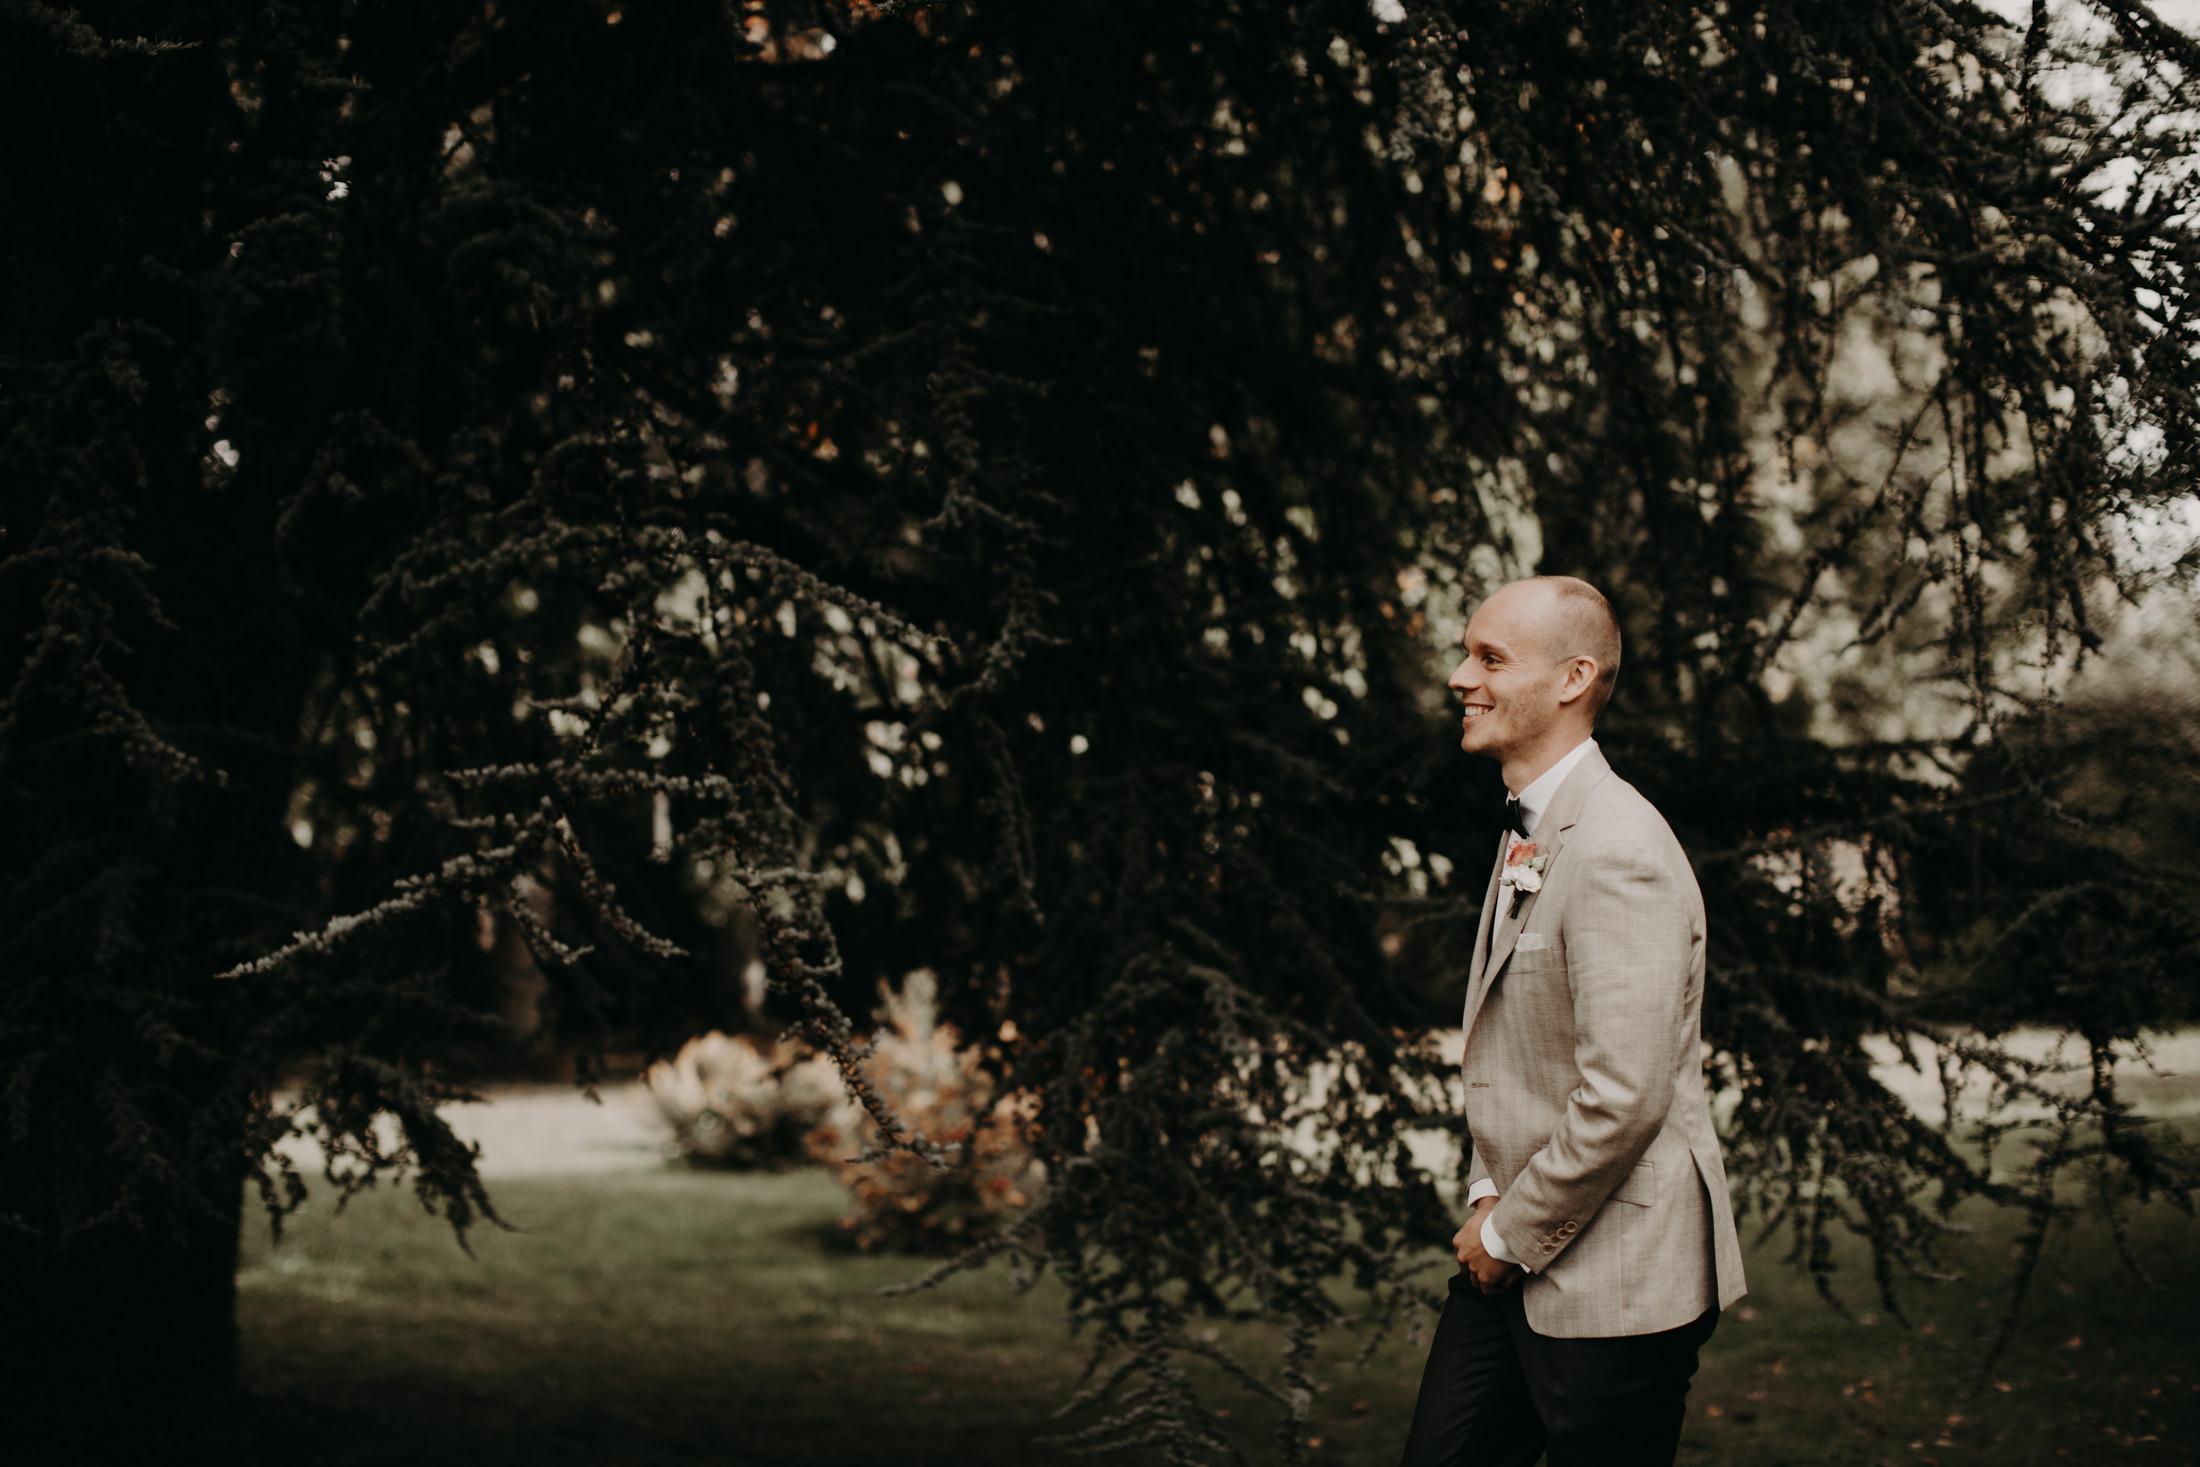 Mariage auvergne photographe wedding_-18.jpg